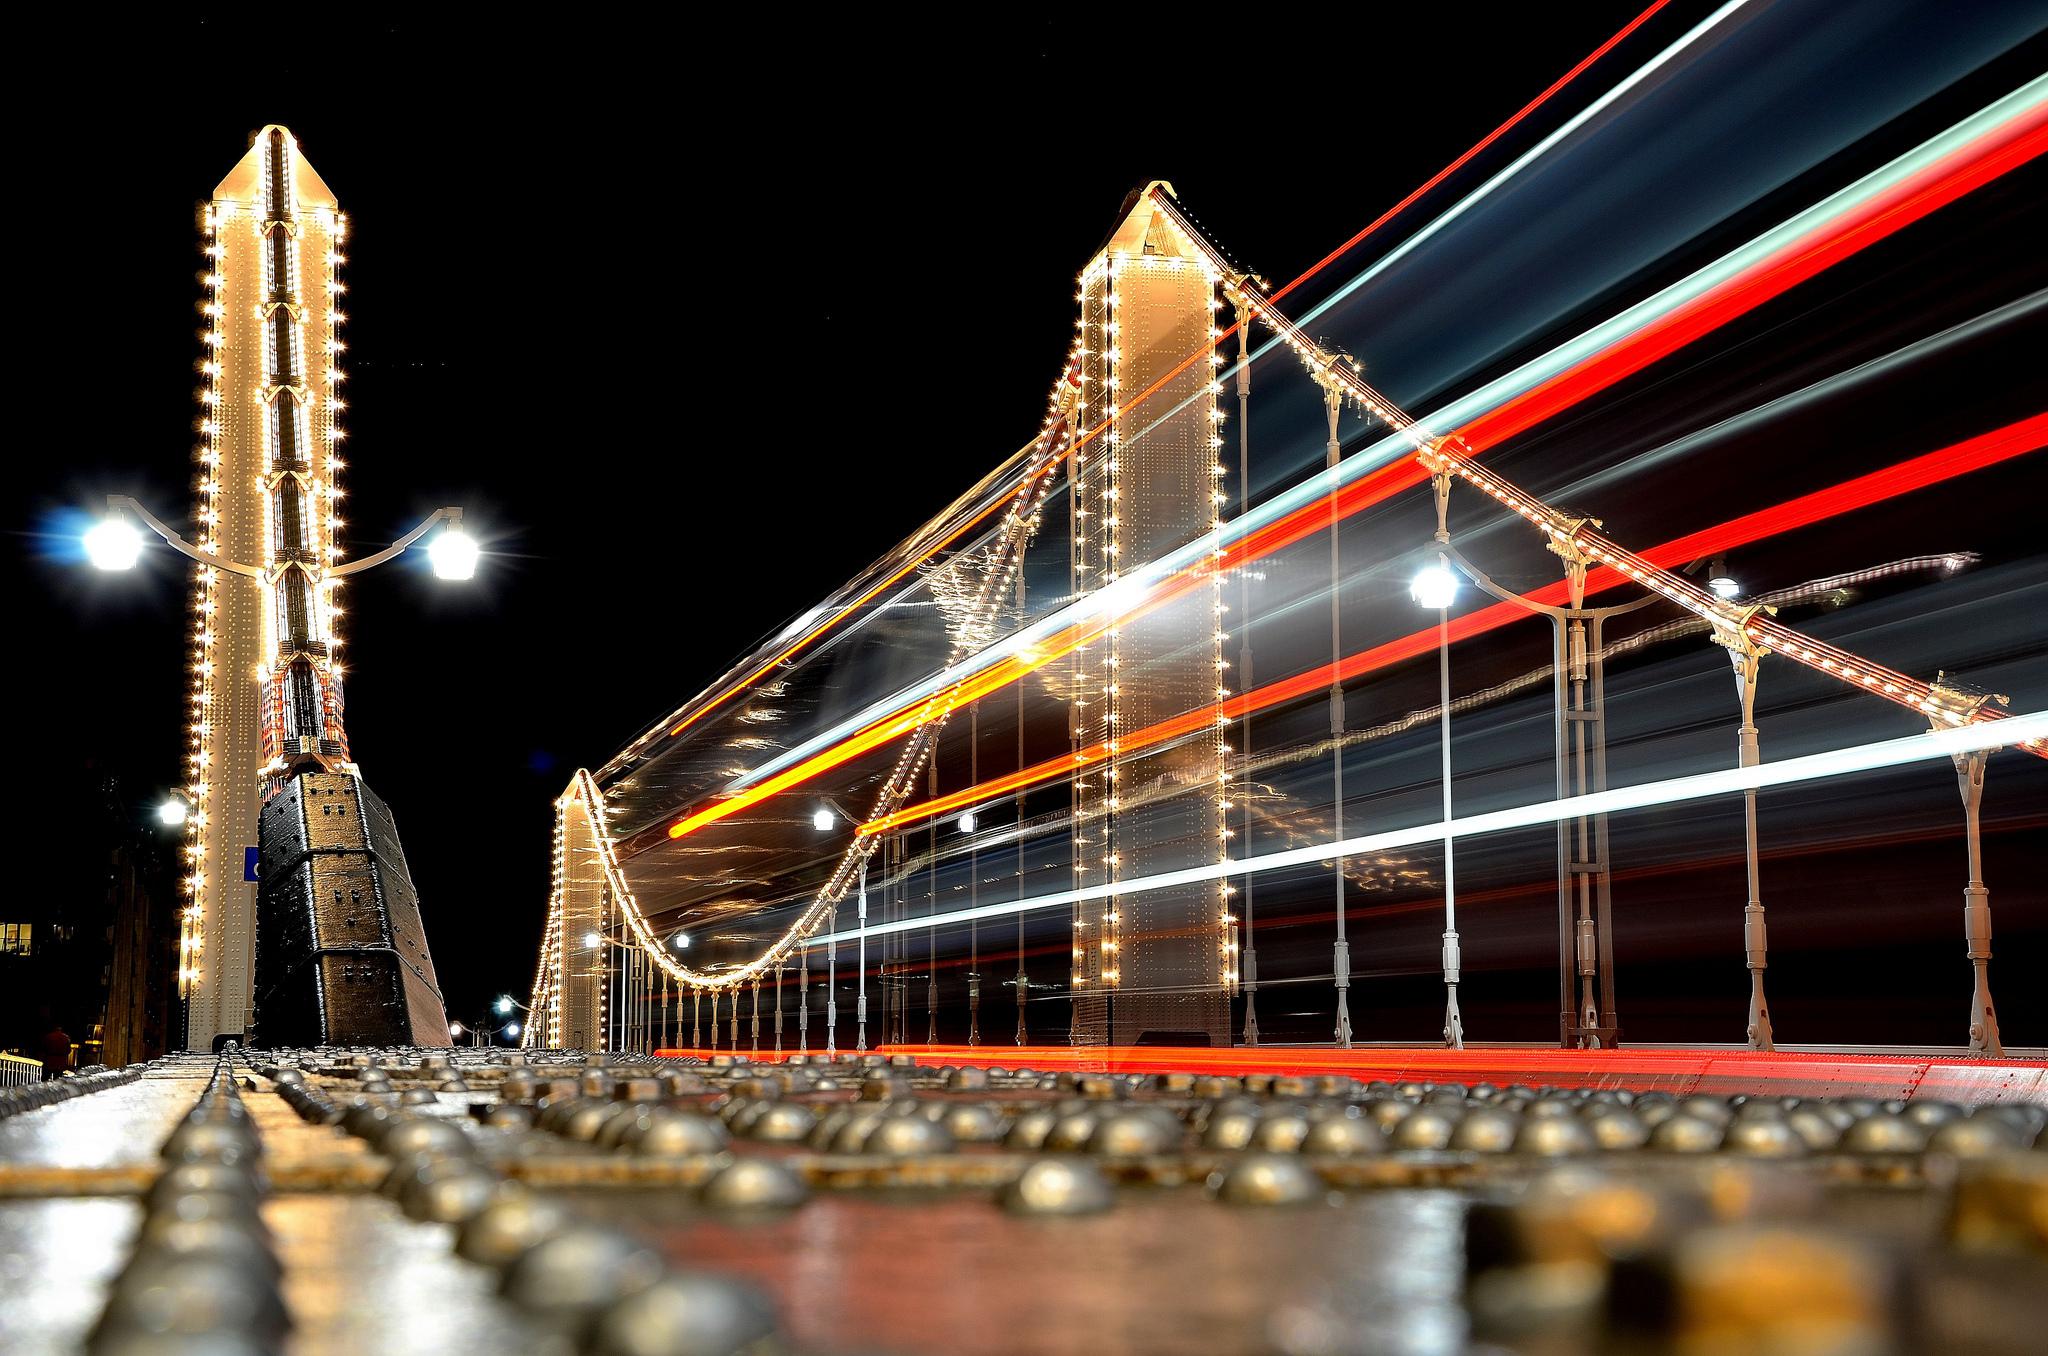 bridge-bridges-engaging-hd-wallpaper-142945423413